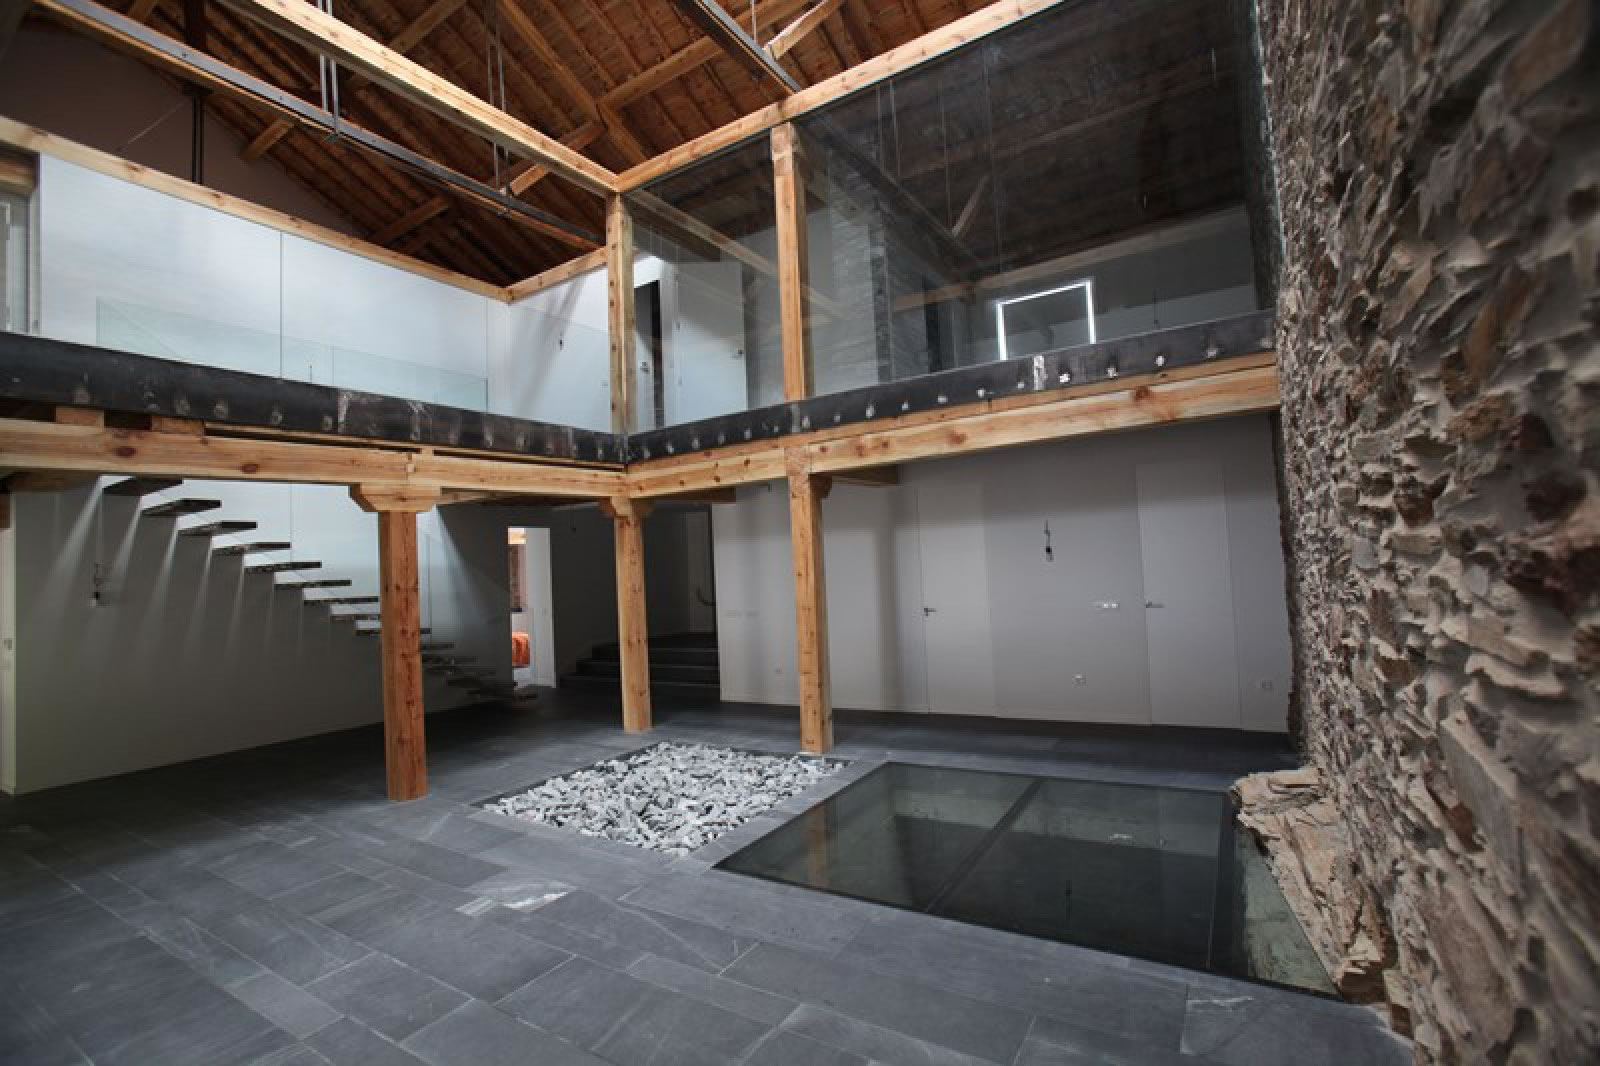 gammes produits carrelage salle de bain terrasse escalier jardin margelle piscine. Black Bedroom Furniture Sets. Home Design Ideas